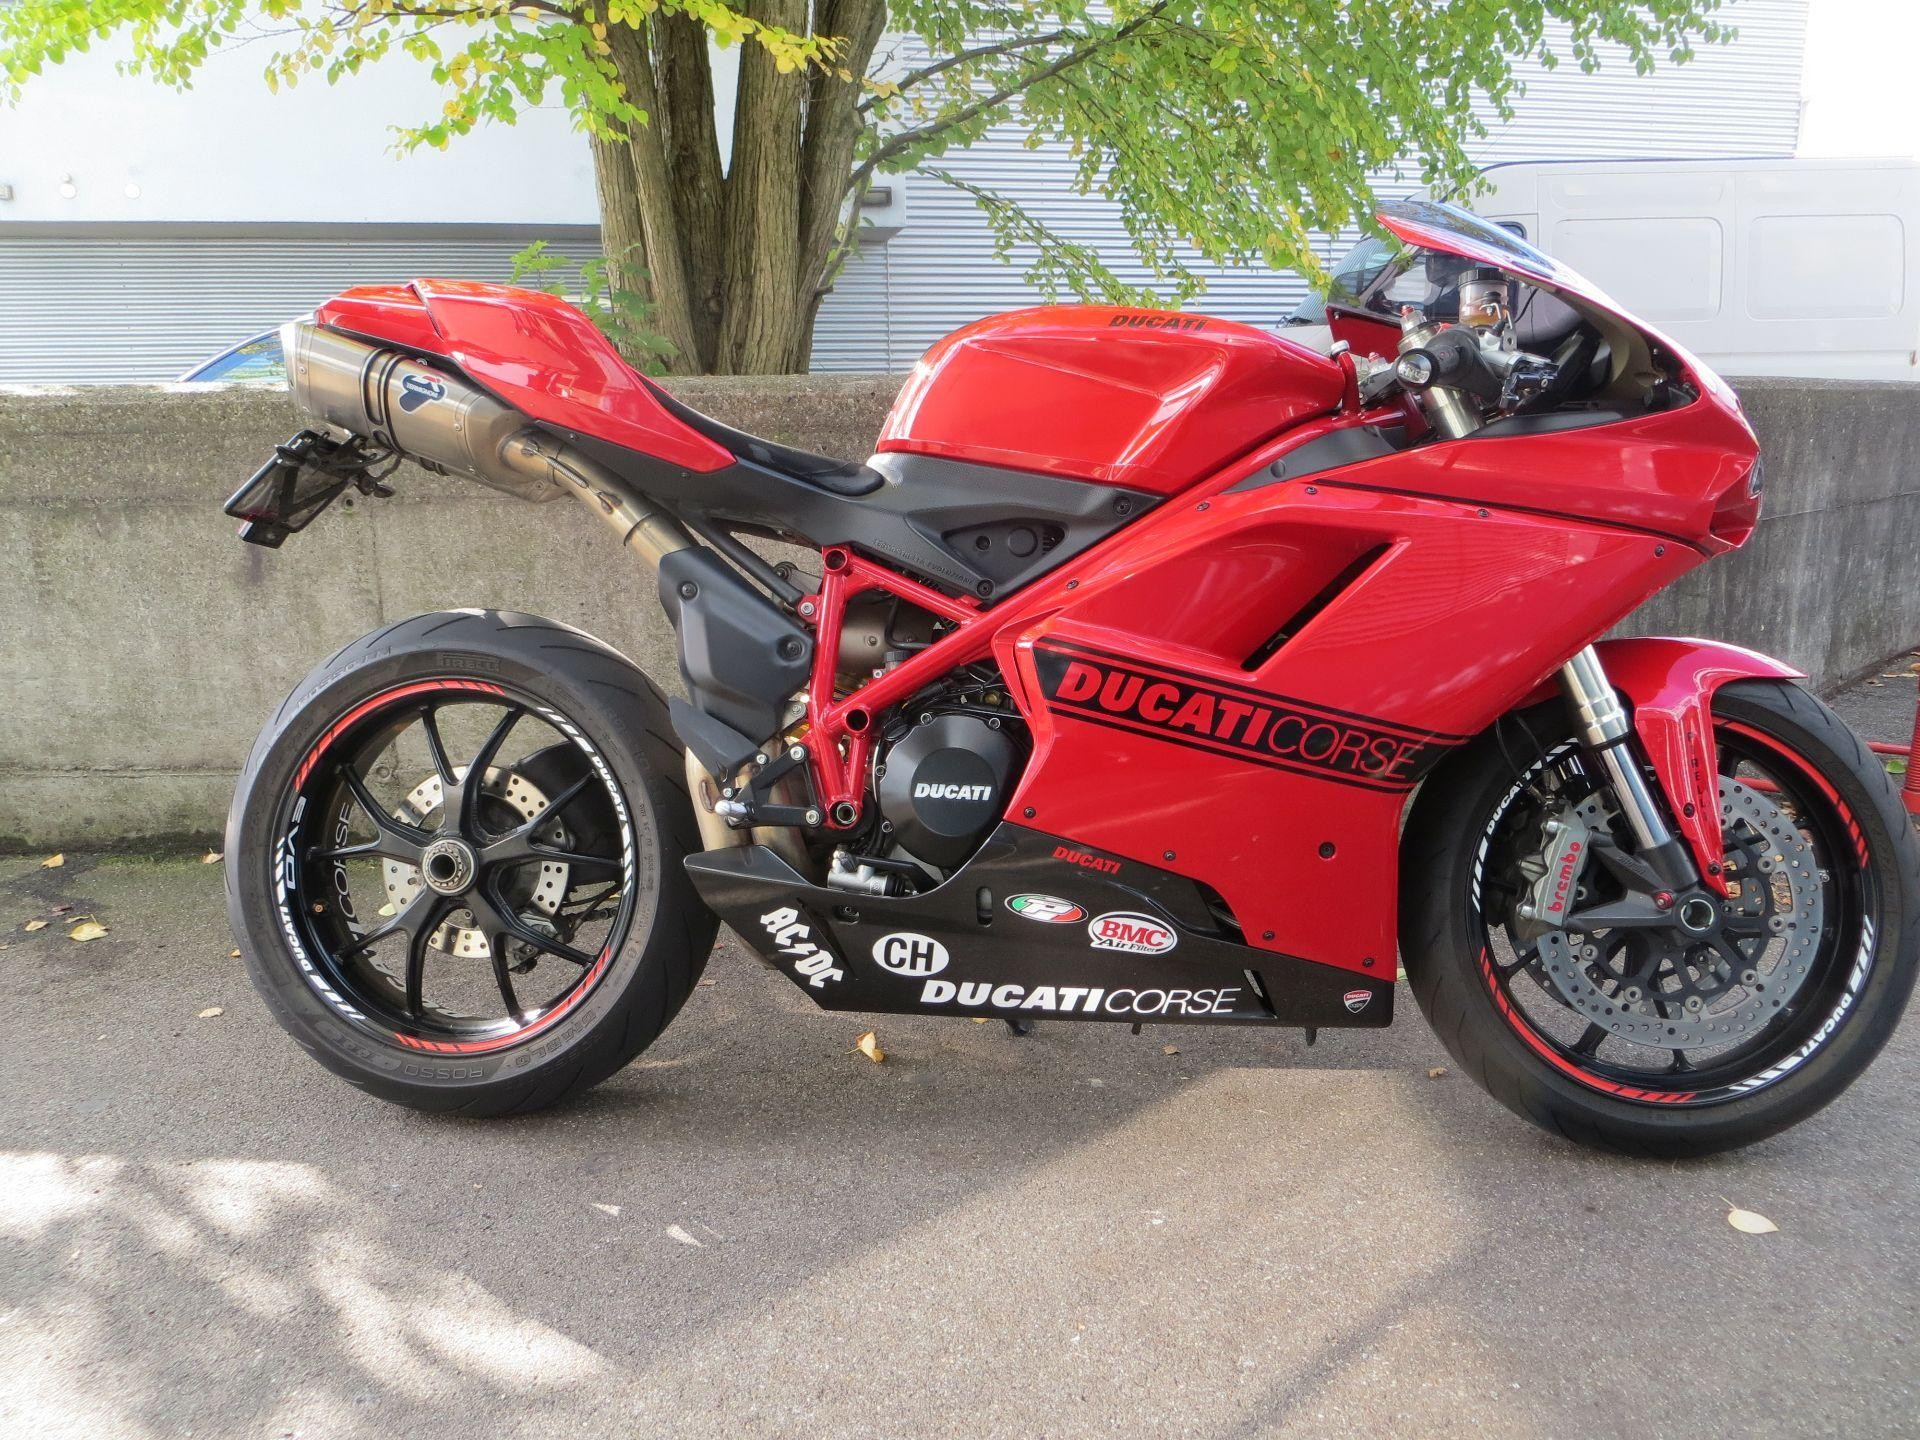 buy motorbike pre owned ducati 848 superbike evo roli s motostyling gmbh schlieren. Black Bedroom Furniture Sets. Home Design Ideas